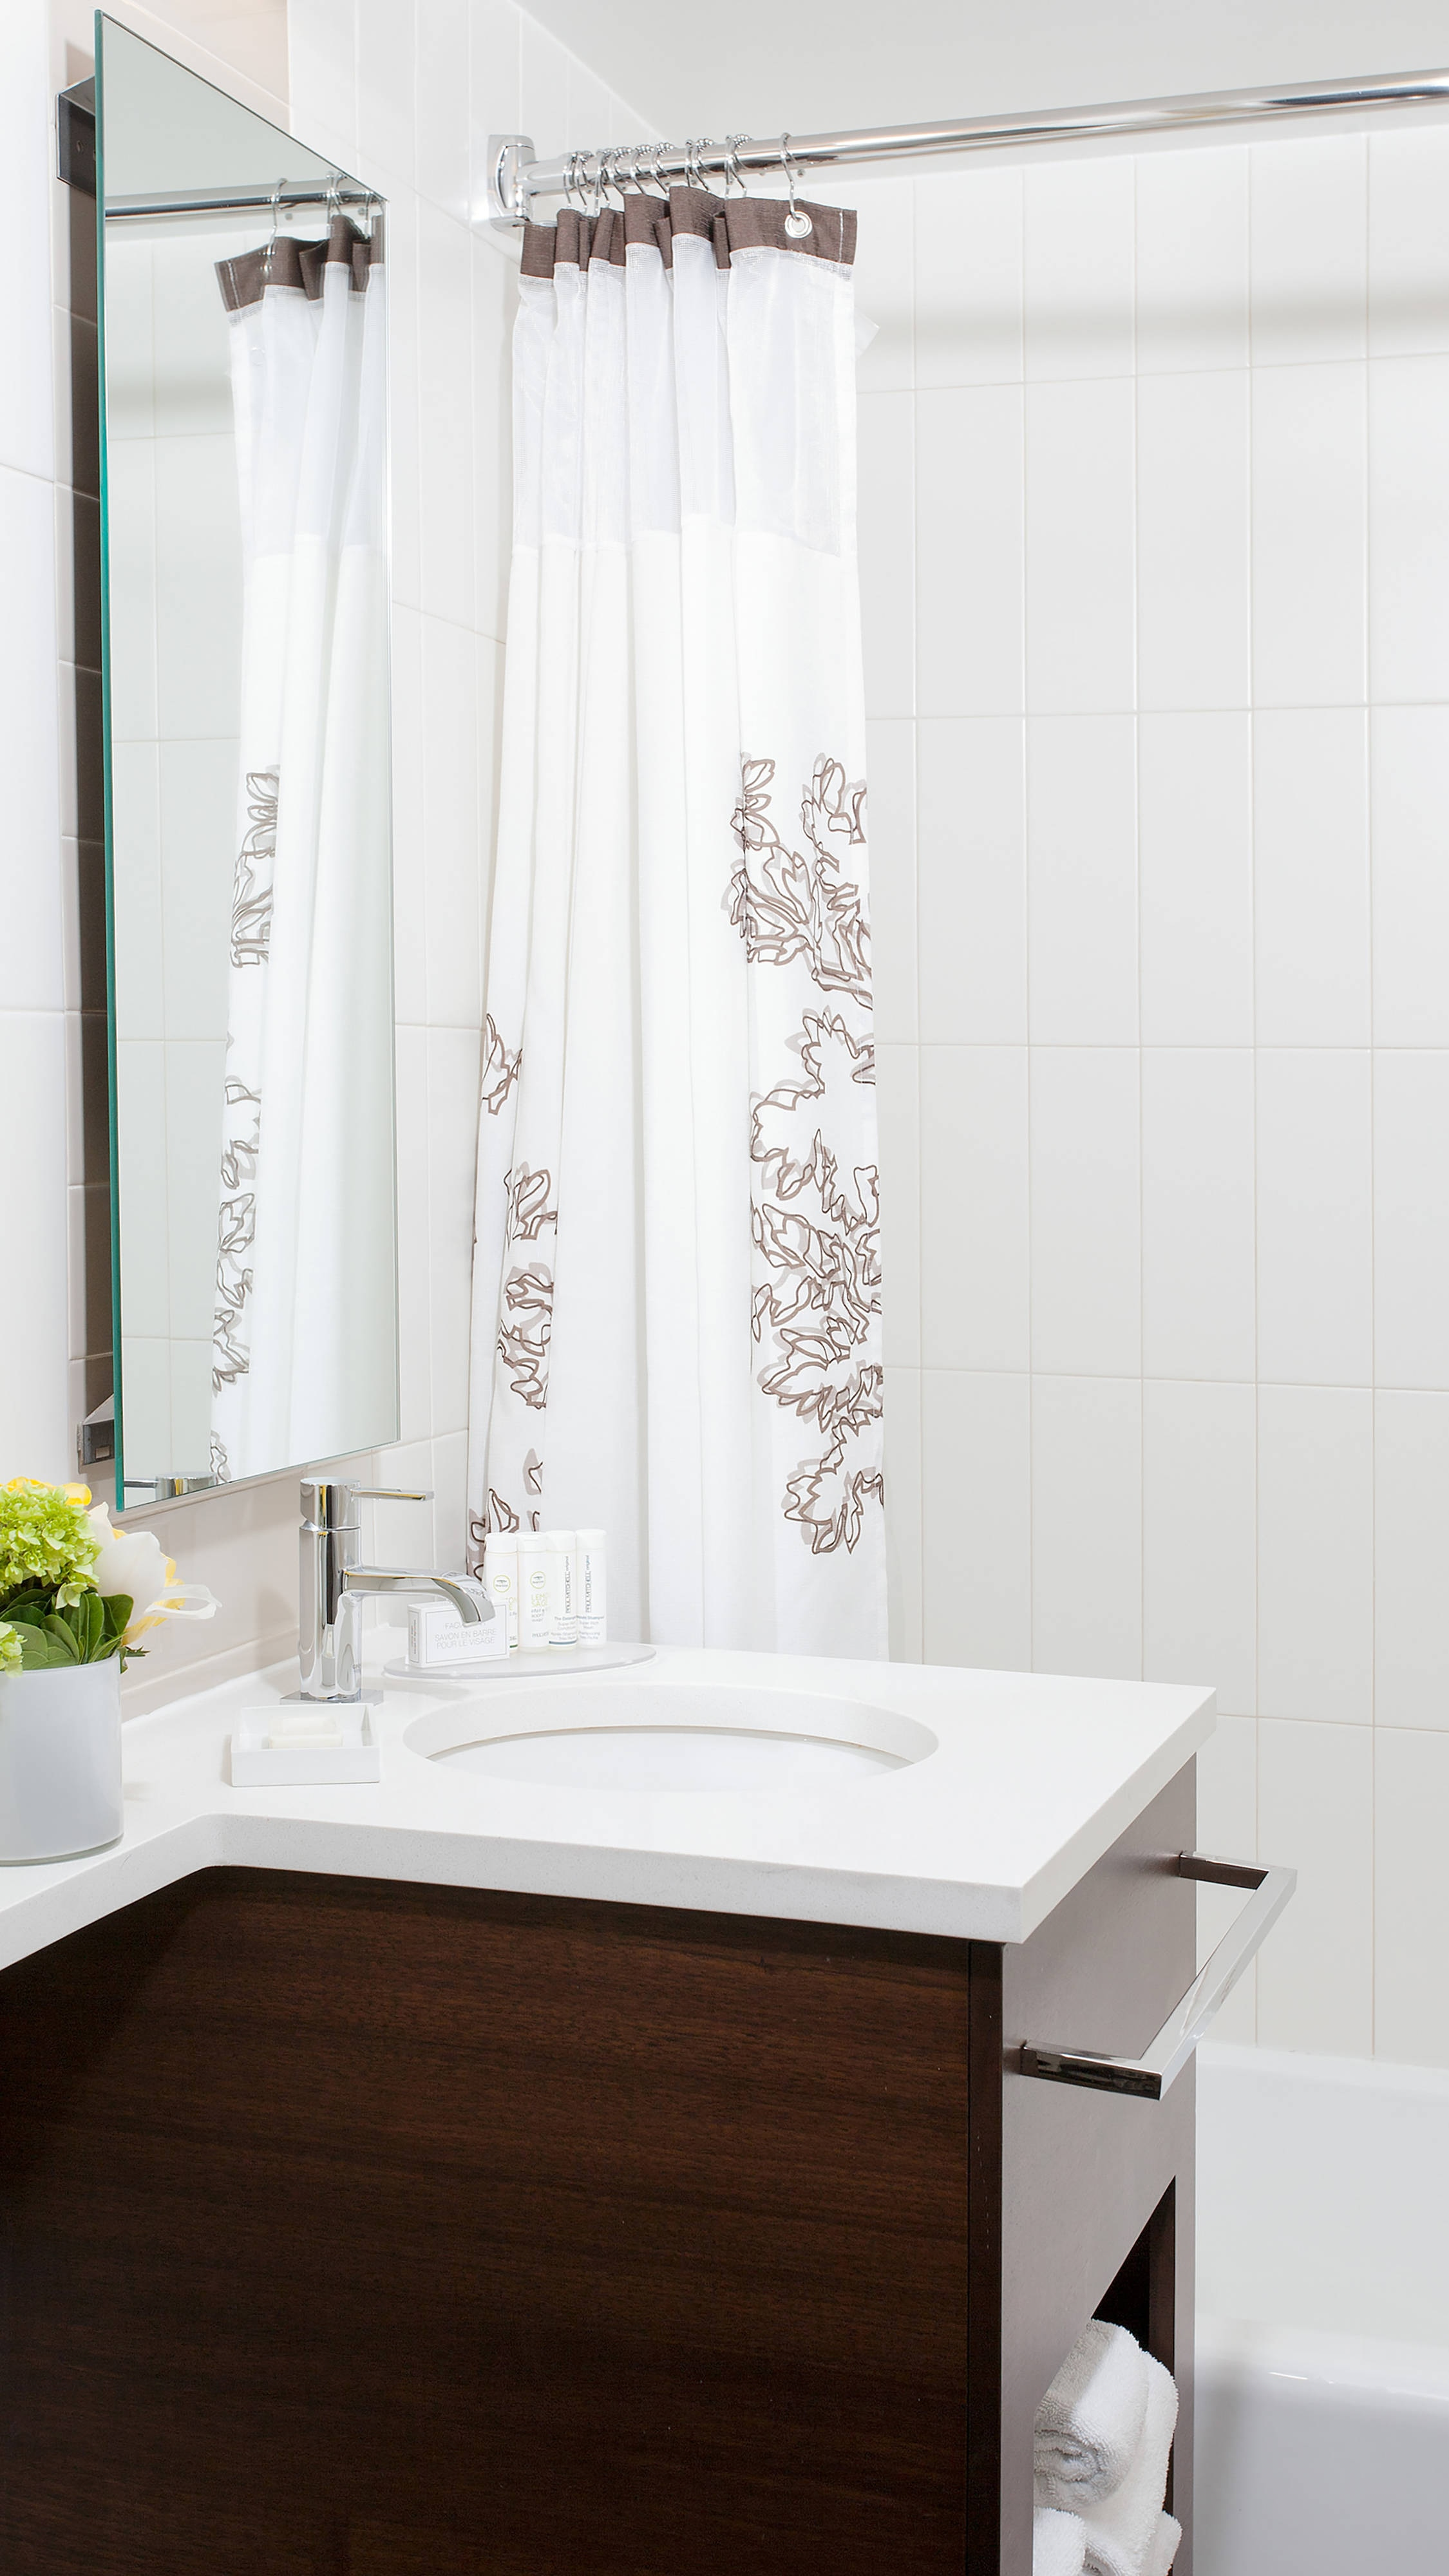 New York City Hotel Bathroom